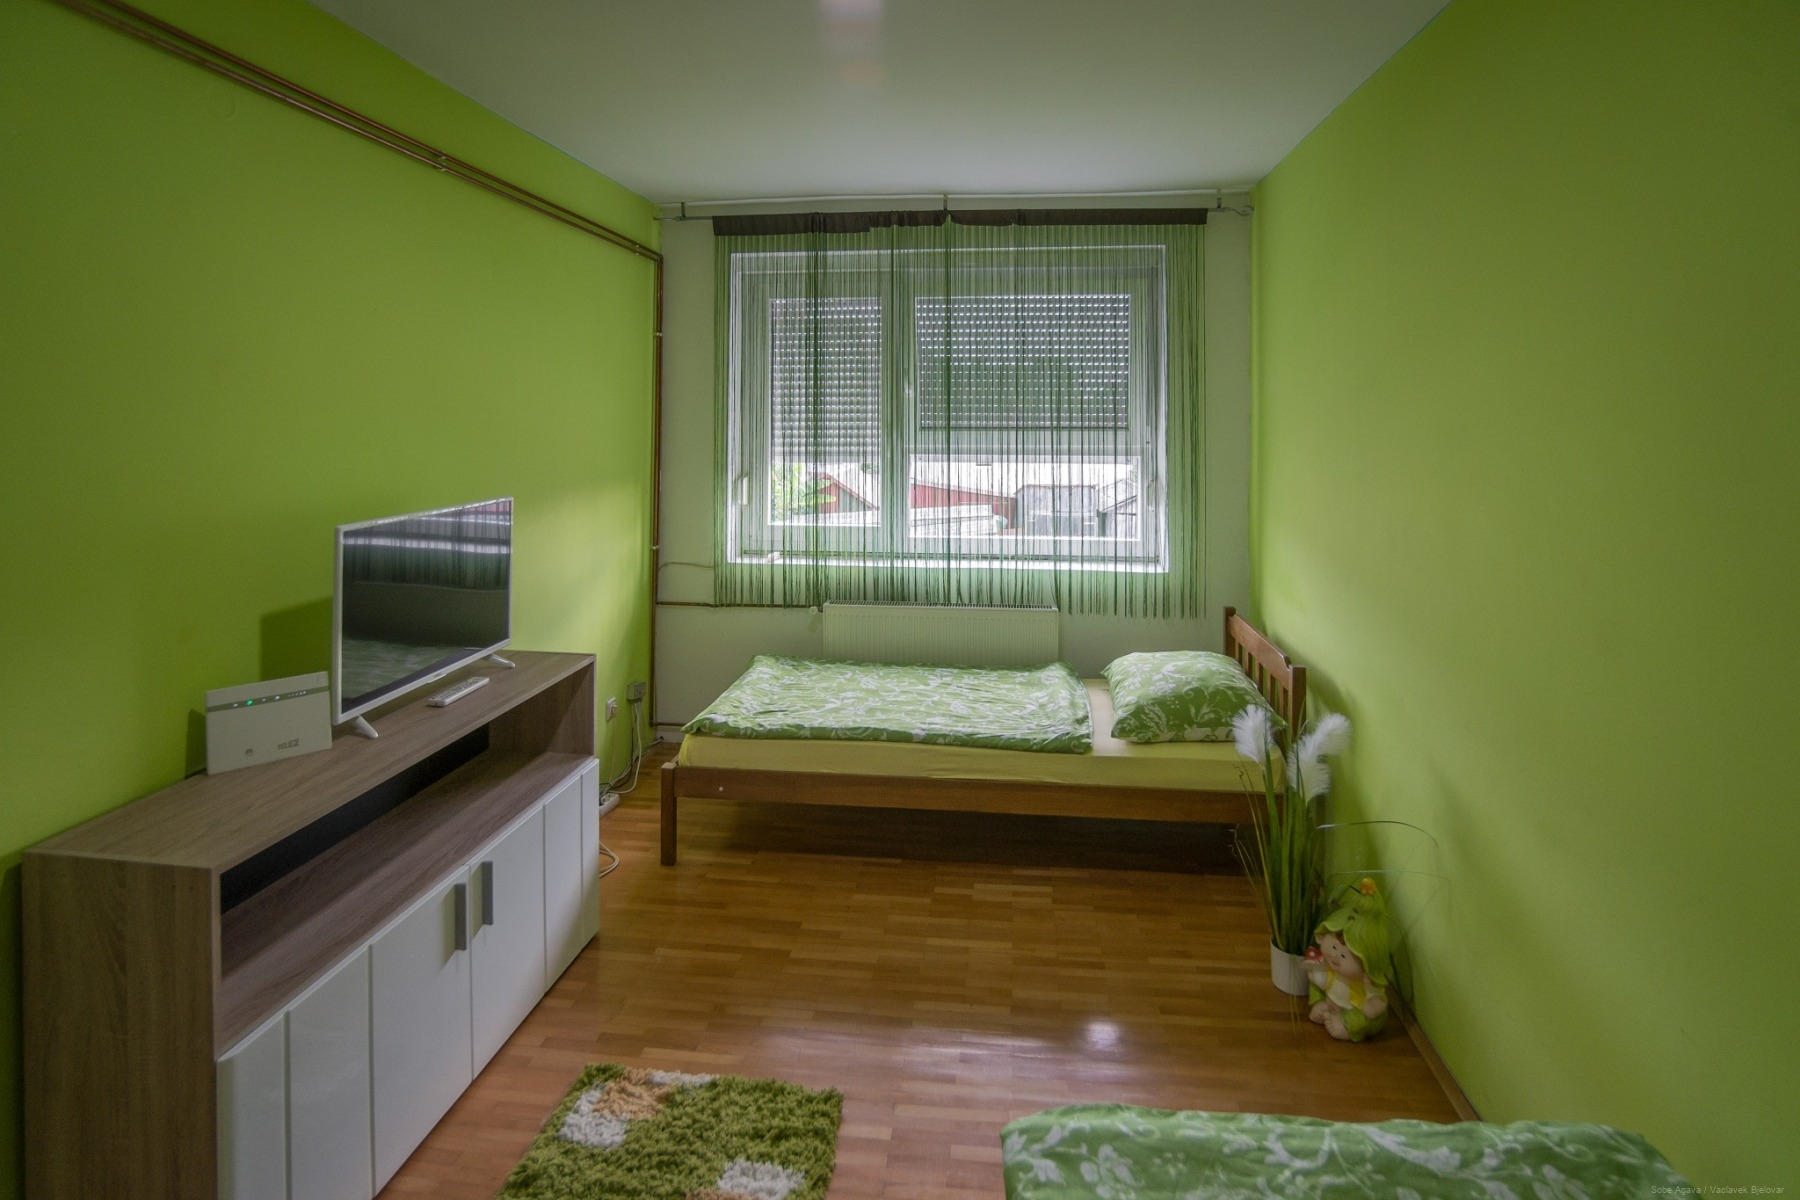 SOBE-I-APARTMANI-AGAVA-VACLAVEK-19-09-2019-HDR-0004